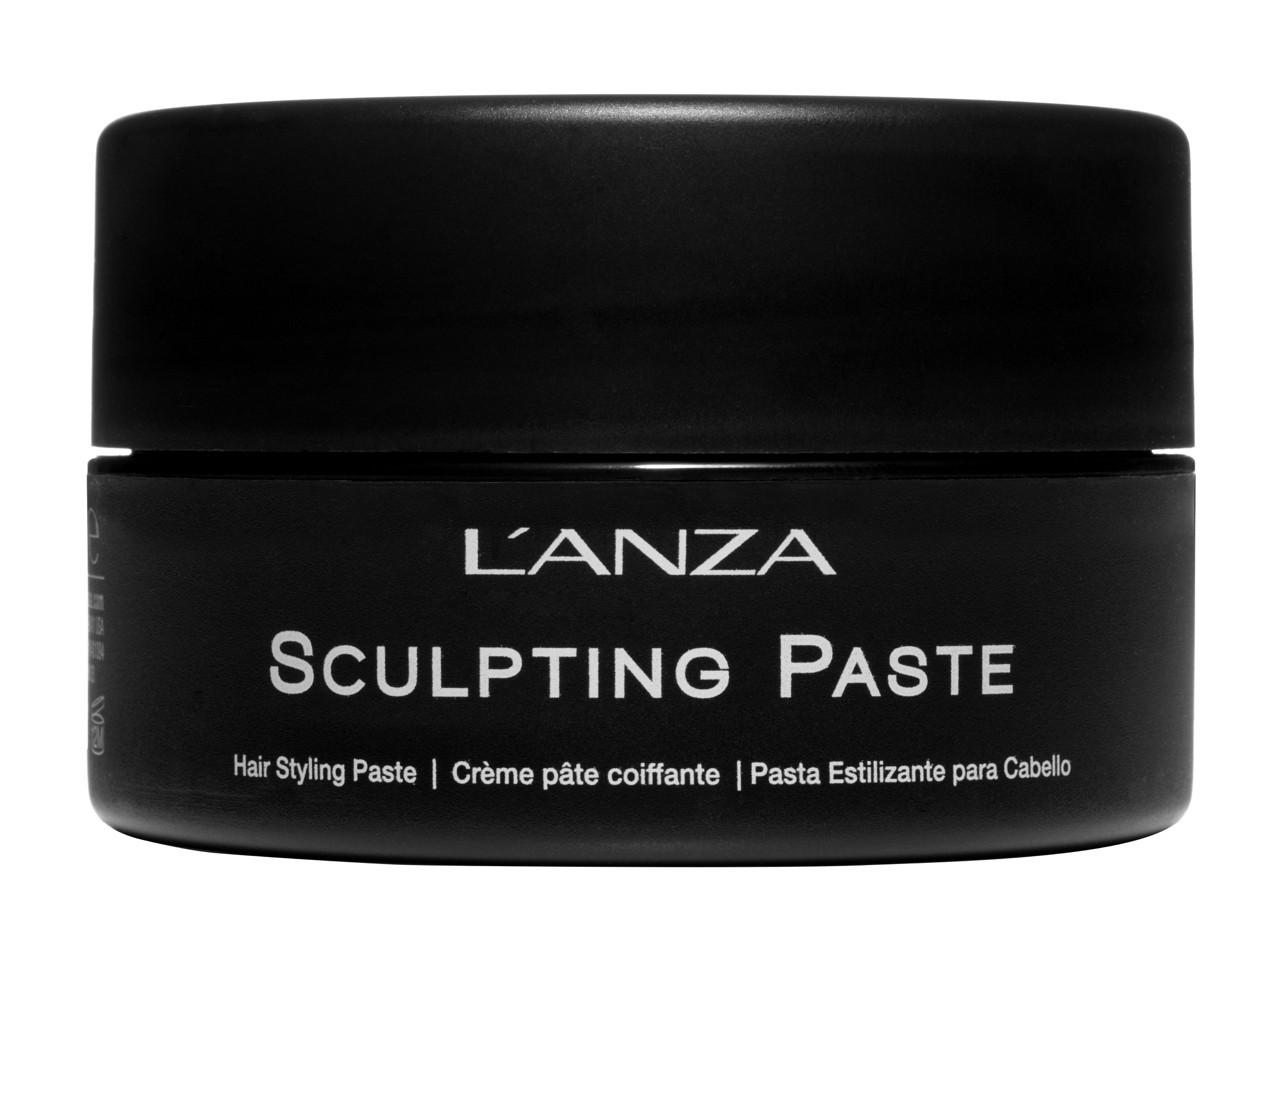 Lanza healing style sculpting paste Паста для текстурирования ph: 6.0, 100 мл